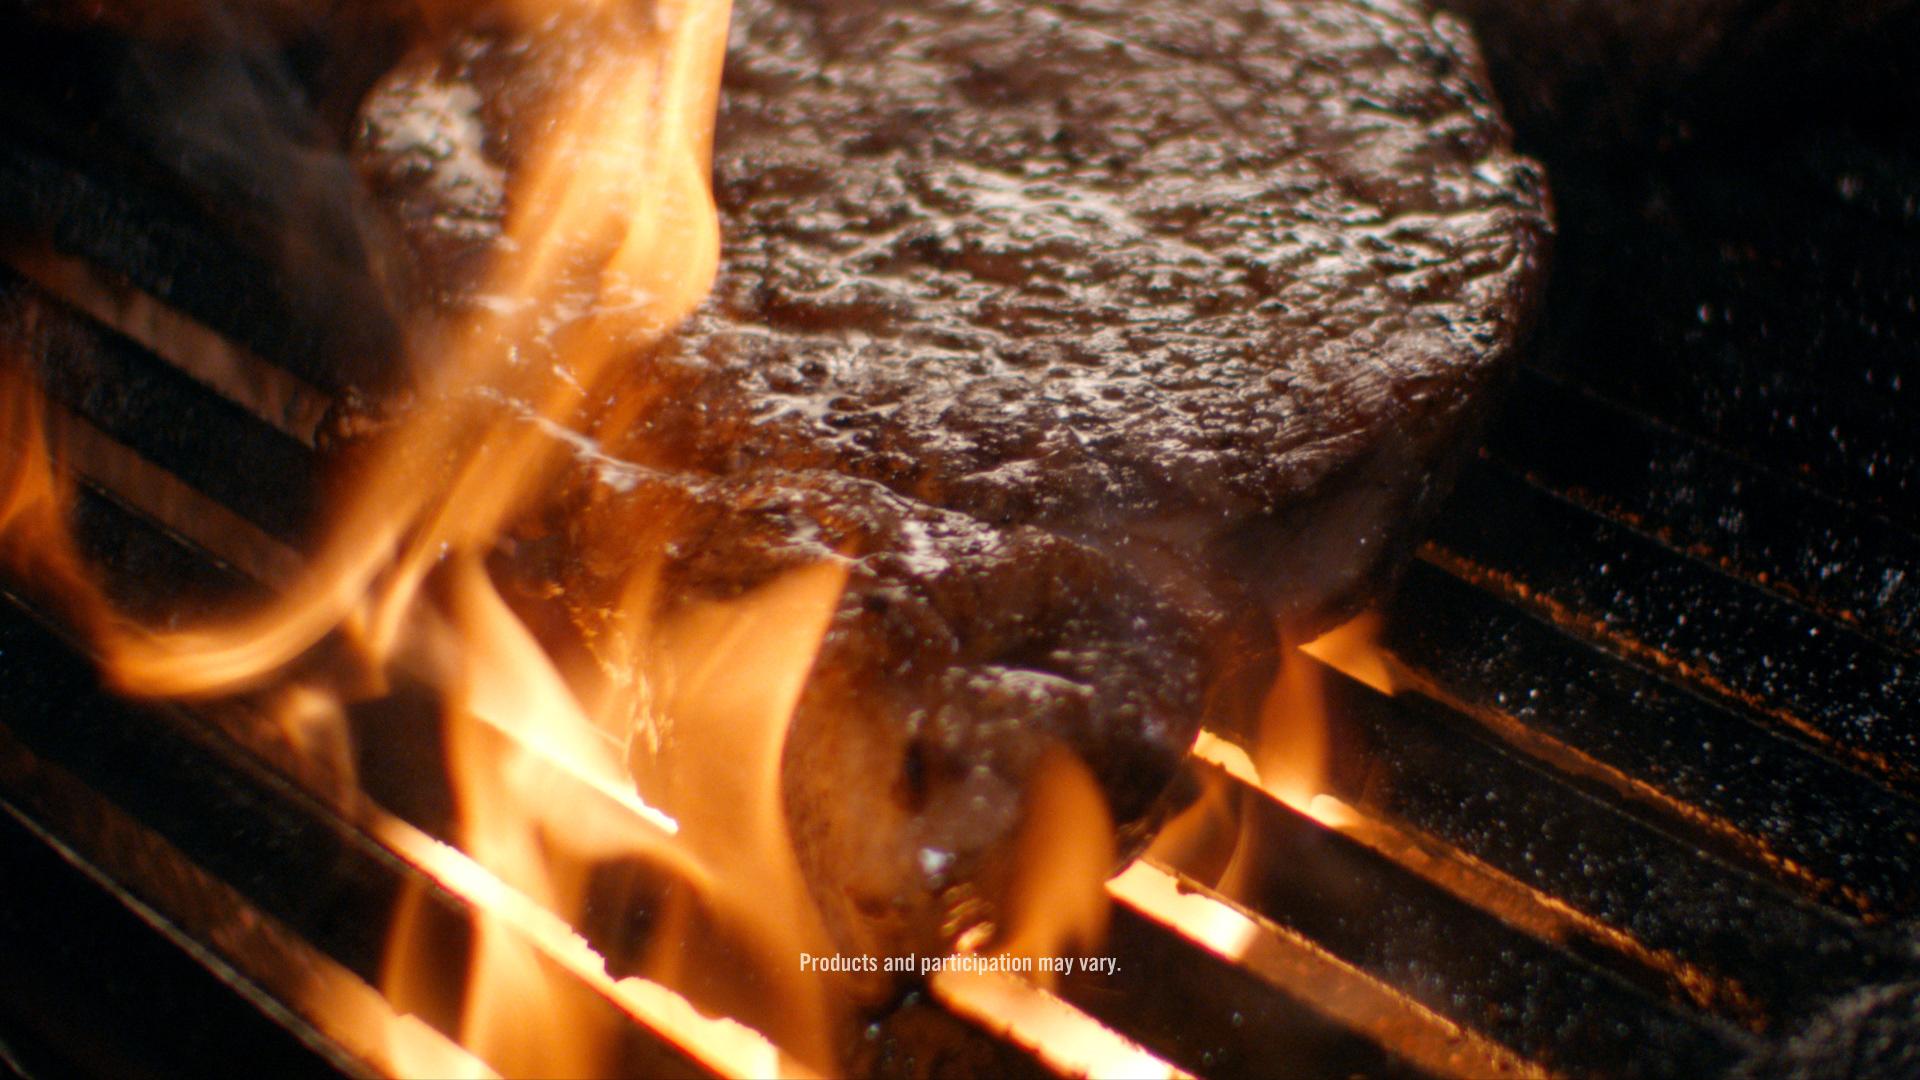 Logan's Roadhouse - Steak